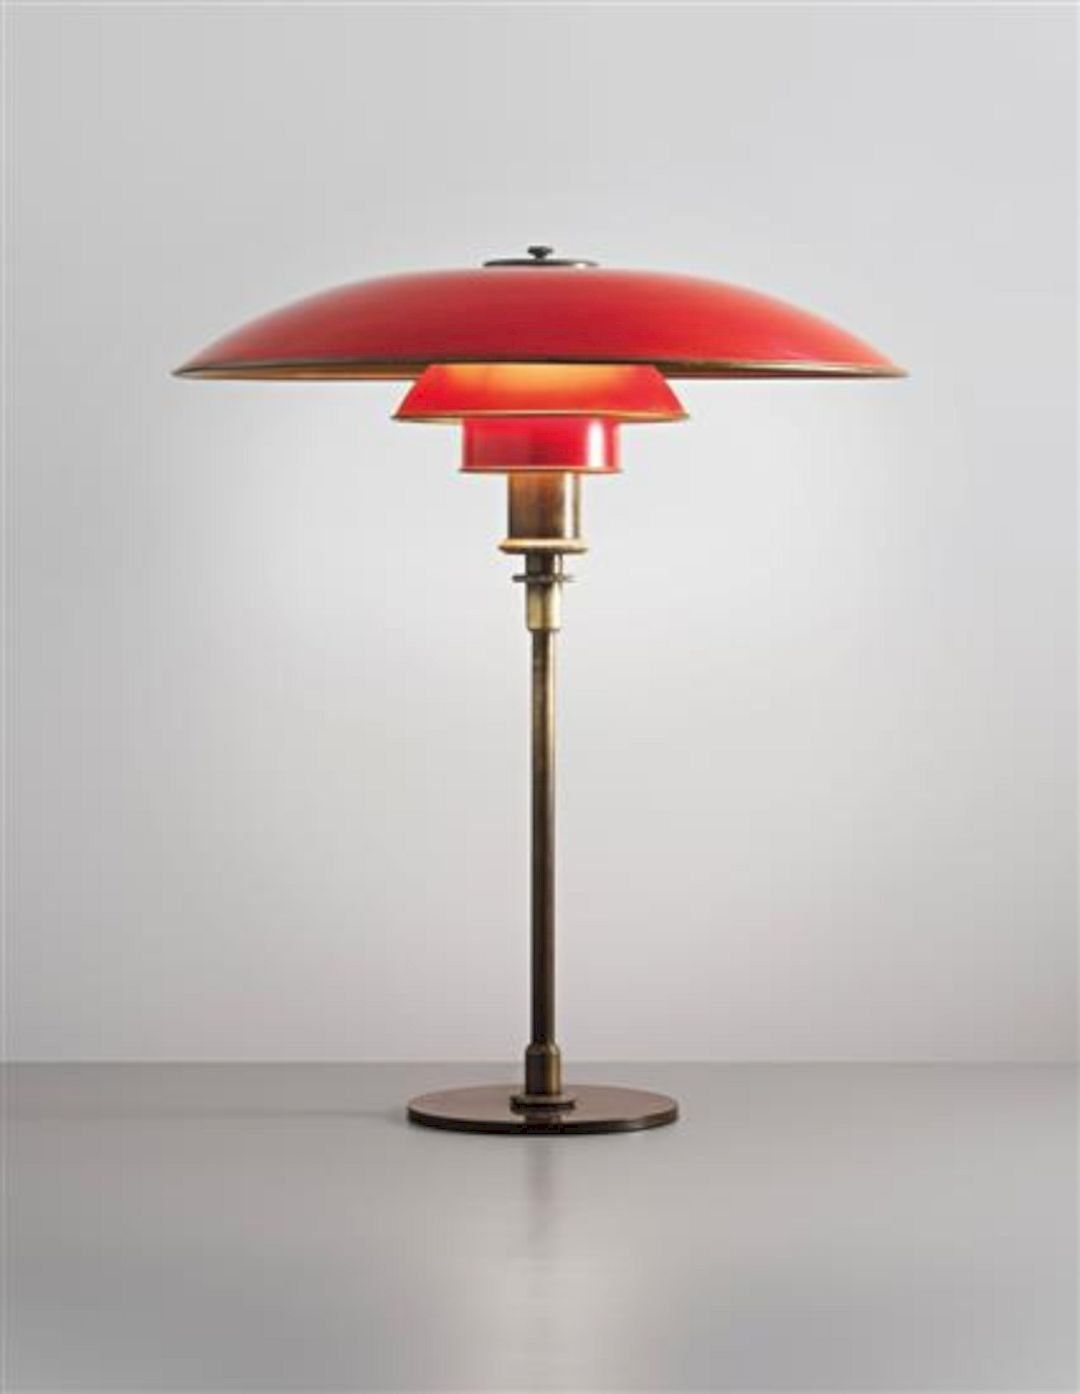 The Herston Self Balancing Desk Lamp Beautifully Designed Delicately Engineered Art Deco Lamps Art Deco Lighting Art Deco Furniture